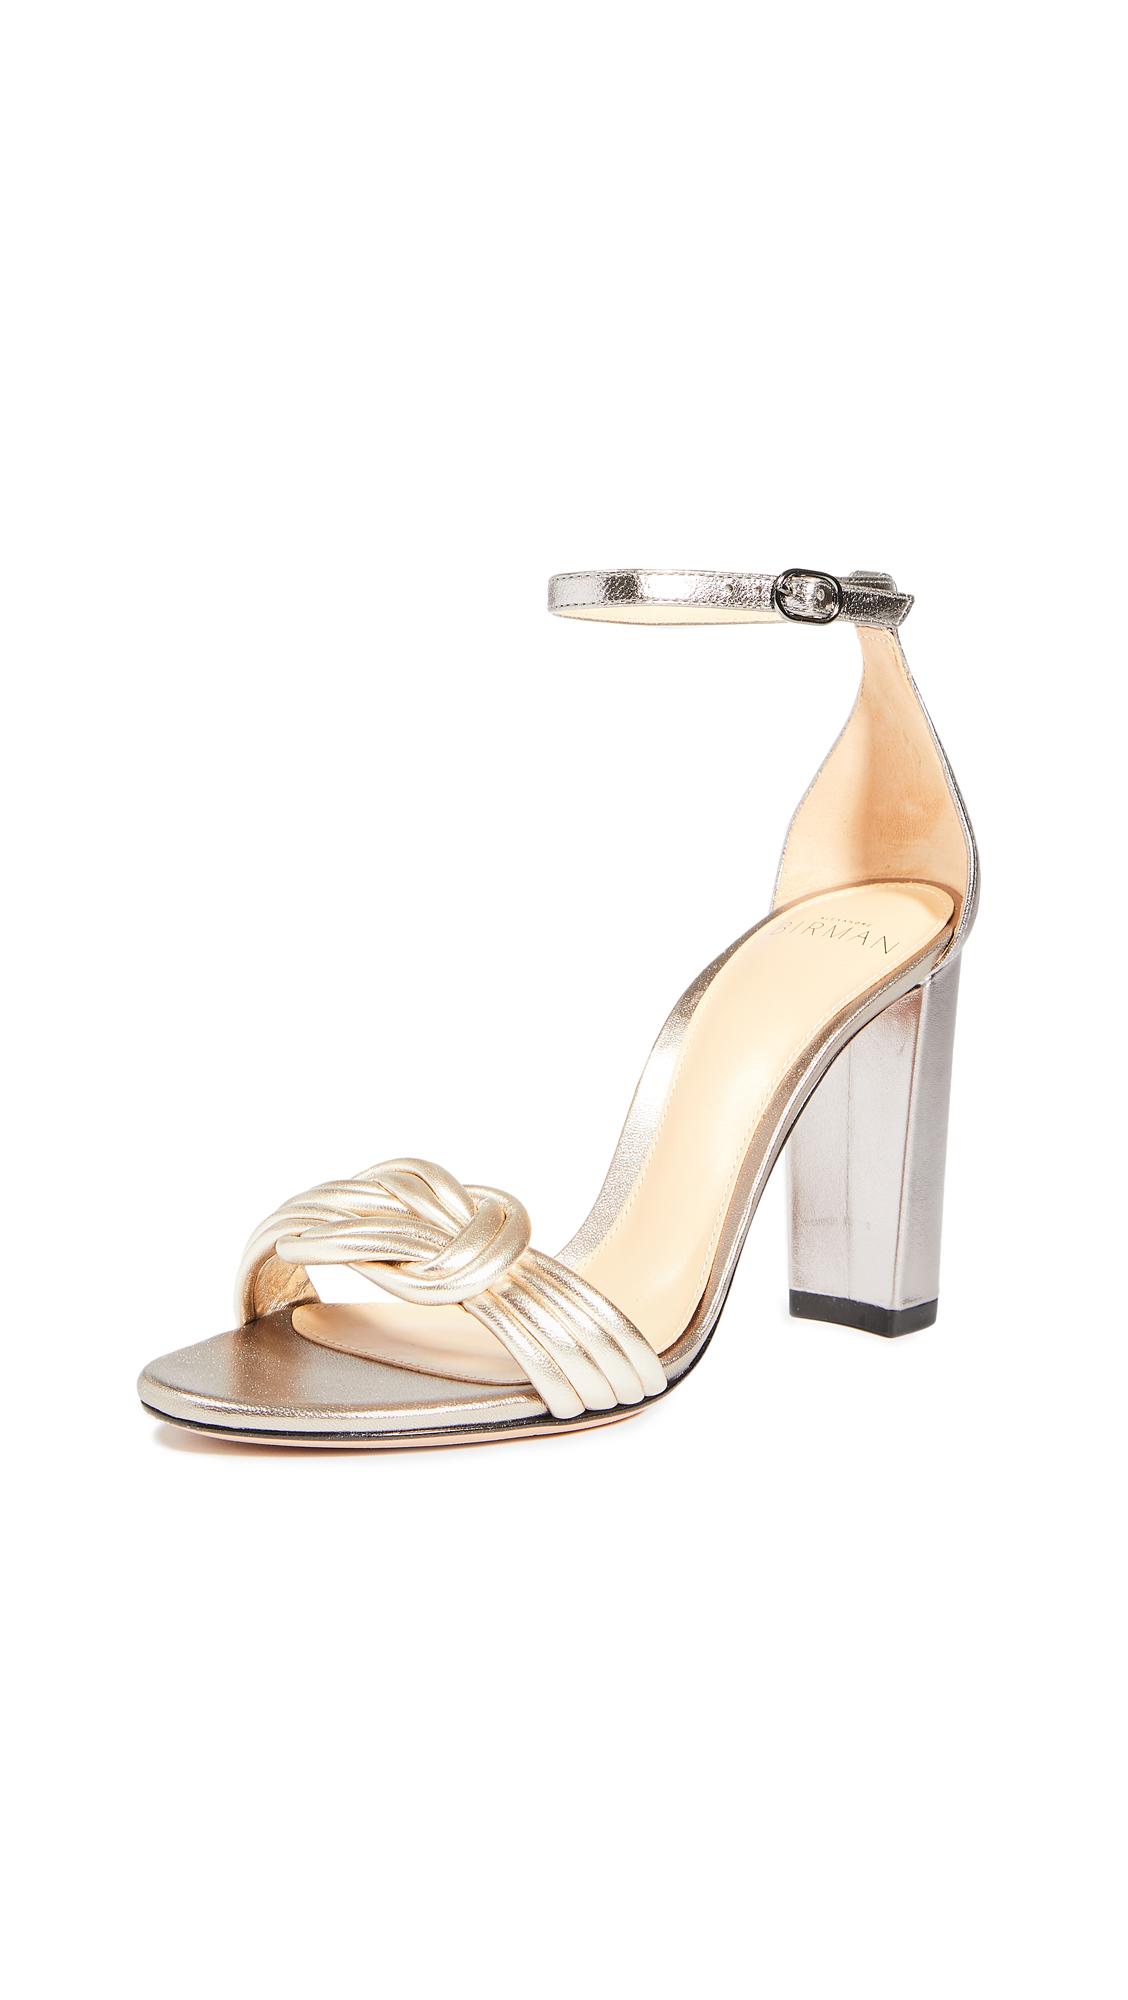 Buy Alexandre Birman Chiara 90mm Block Sandals online, shop Alexandre Birman